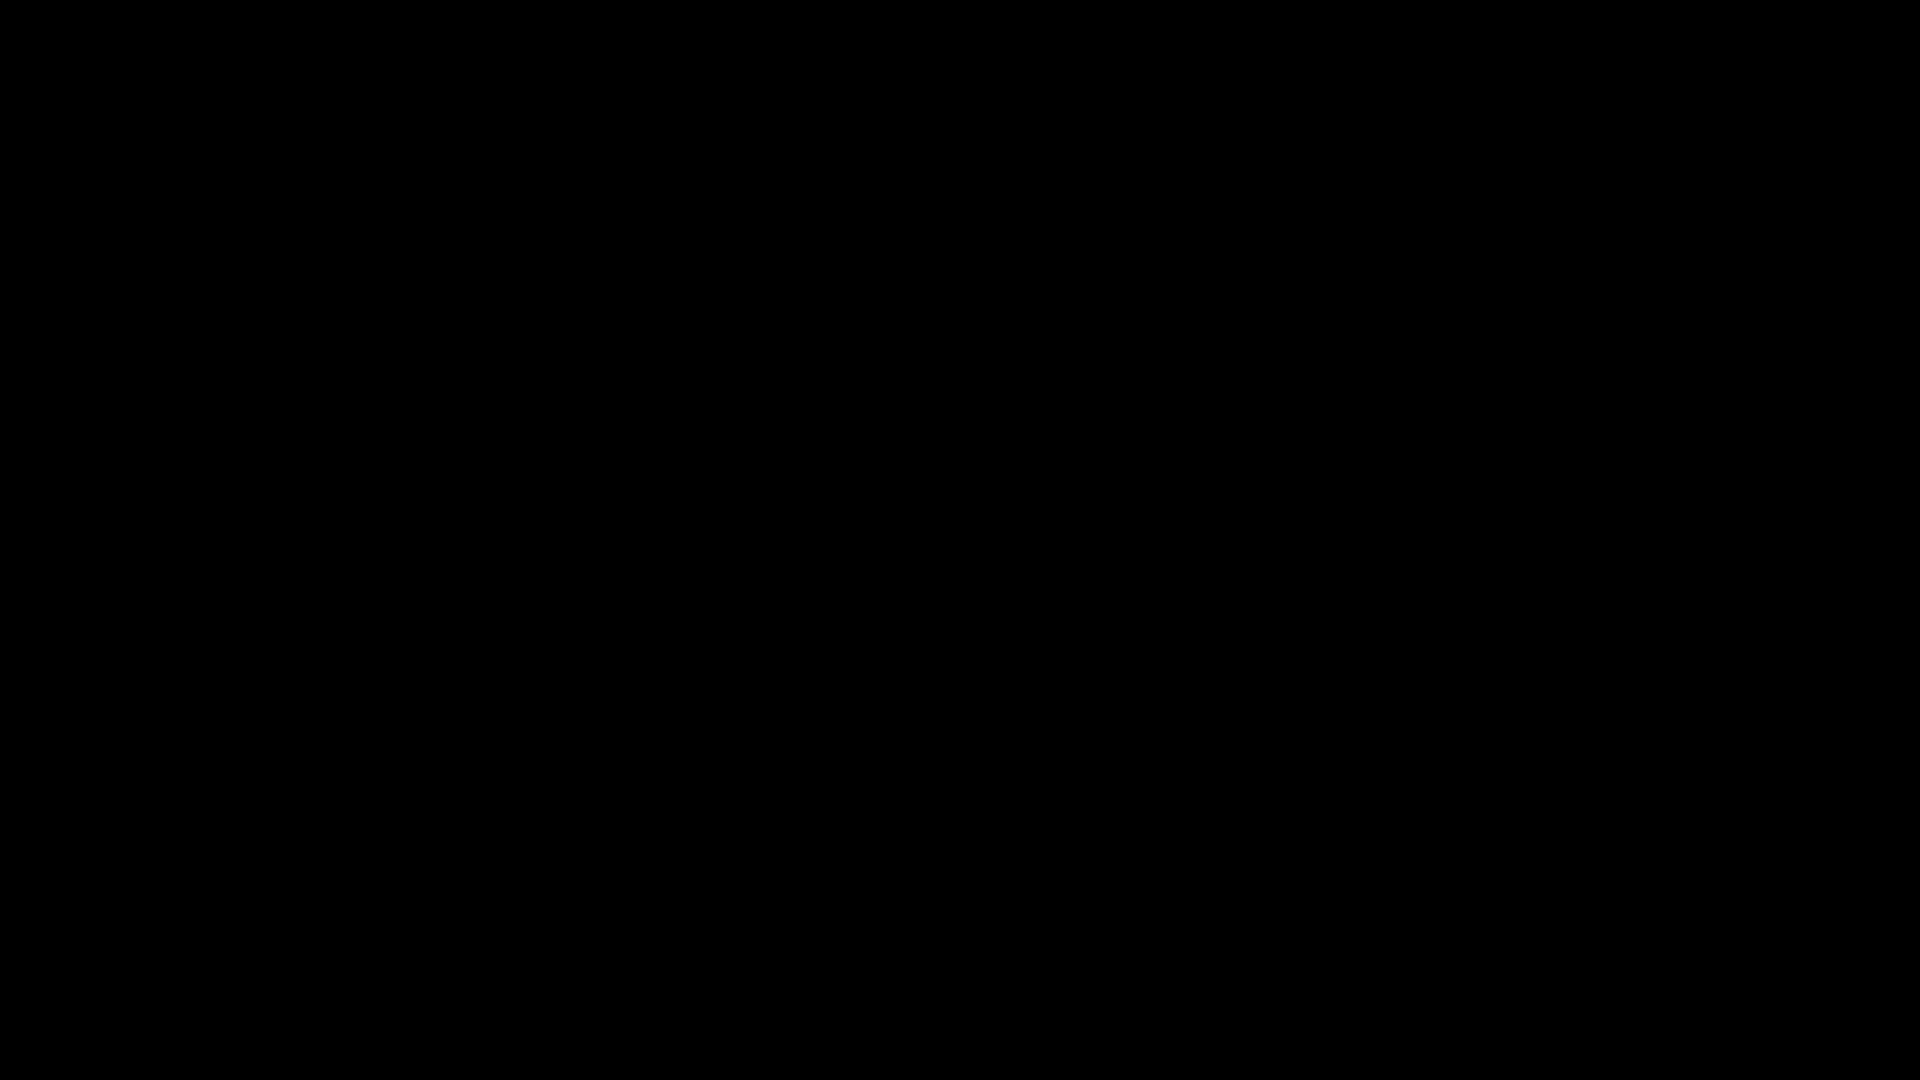 bobandjudith-d1-29118-reducednoise